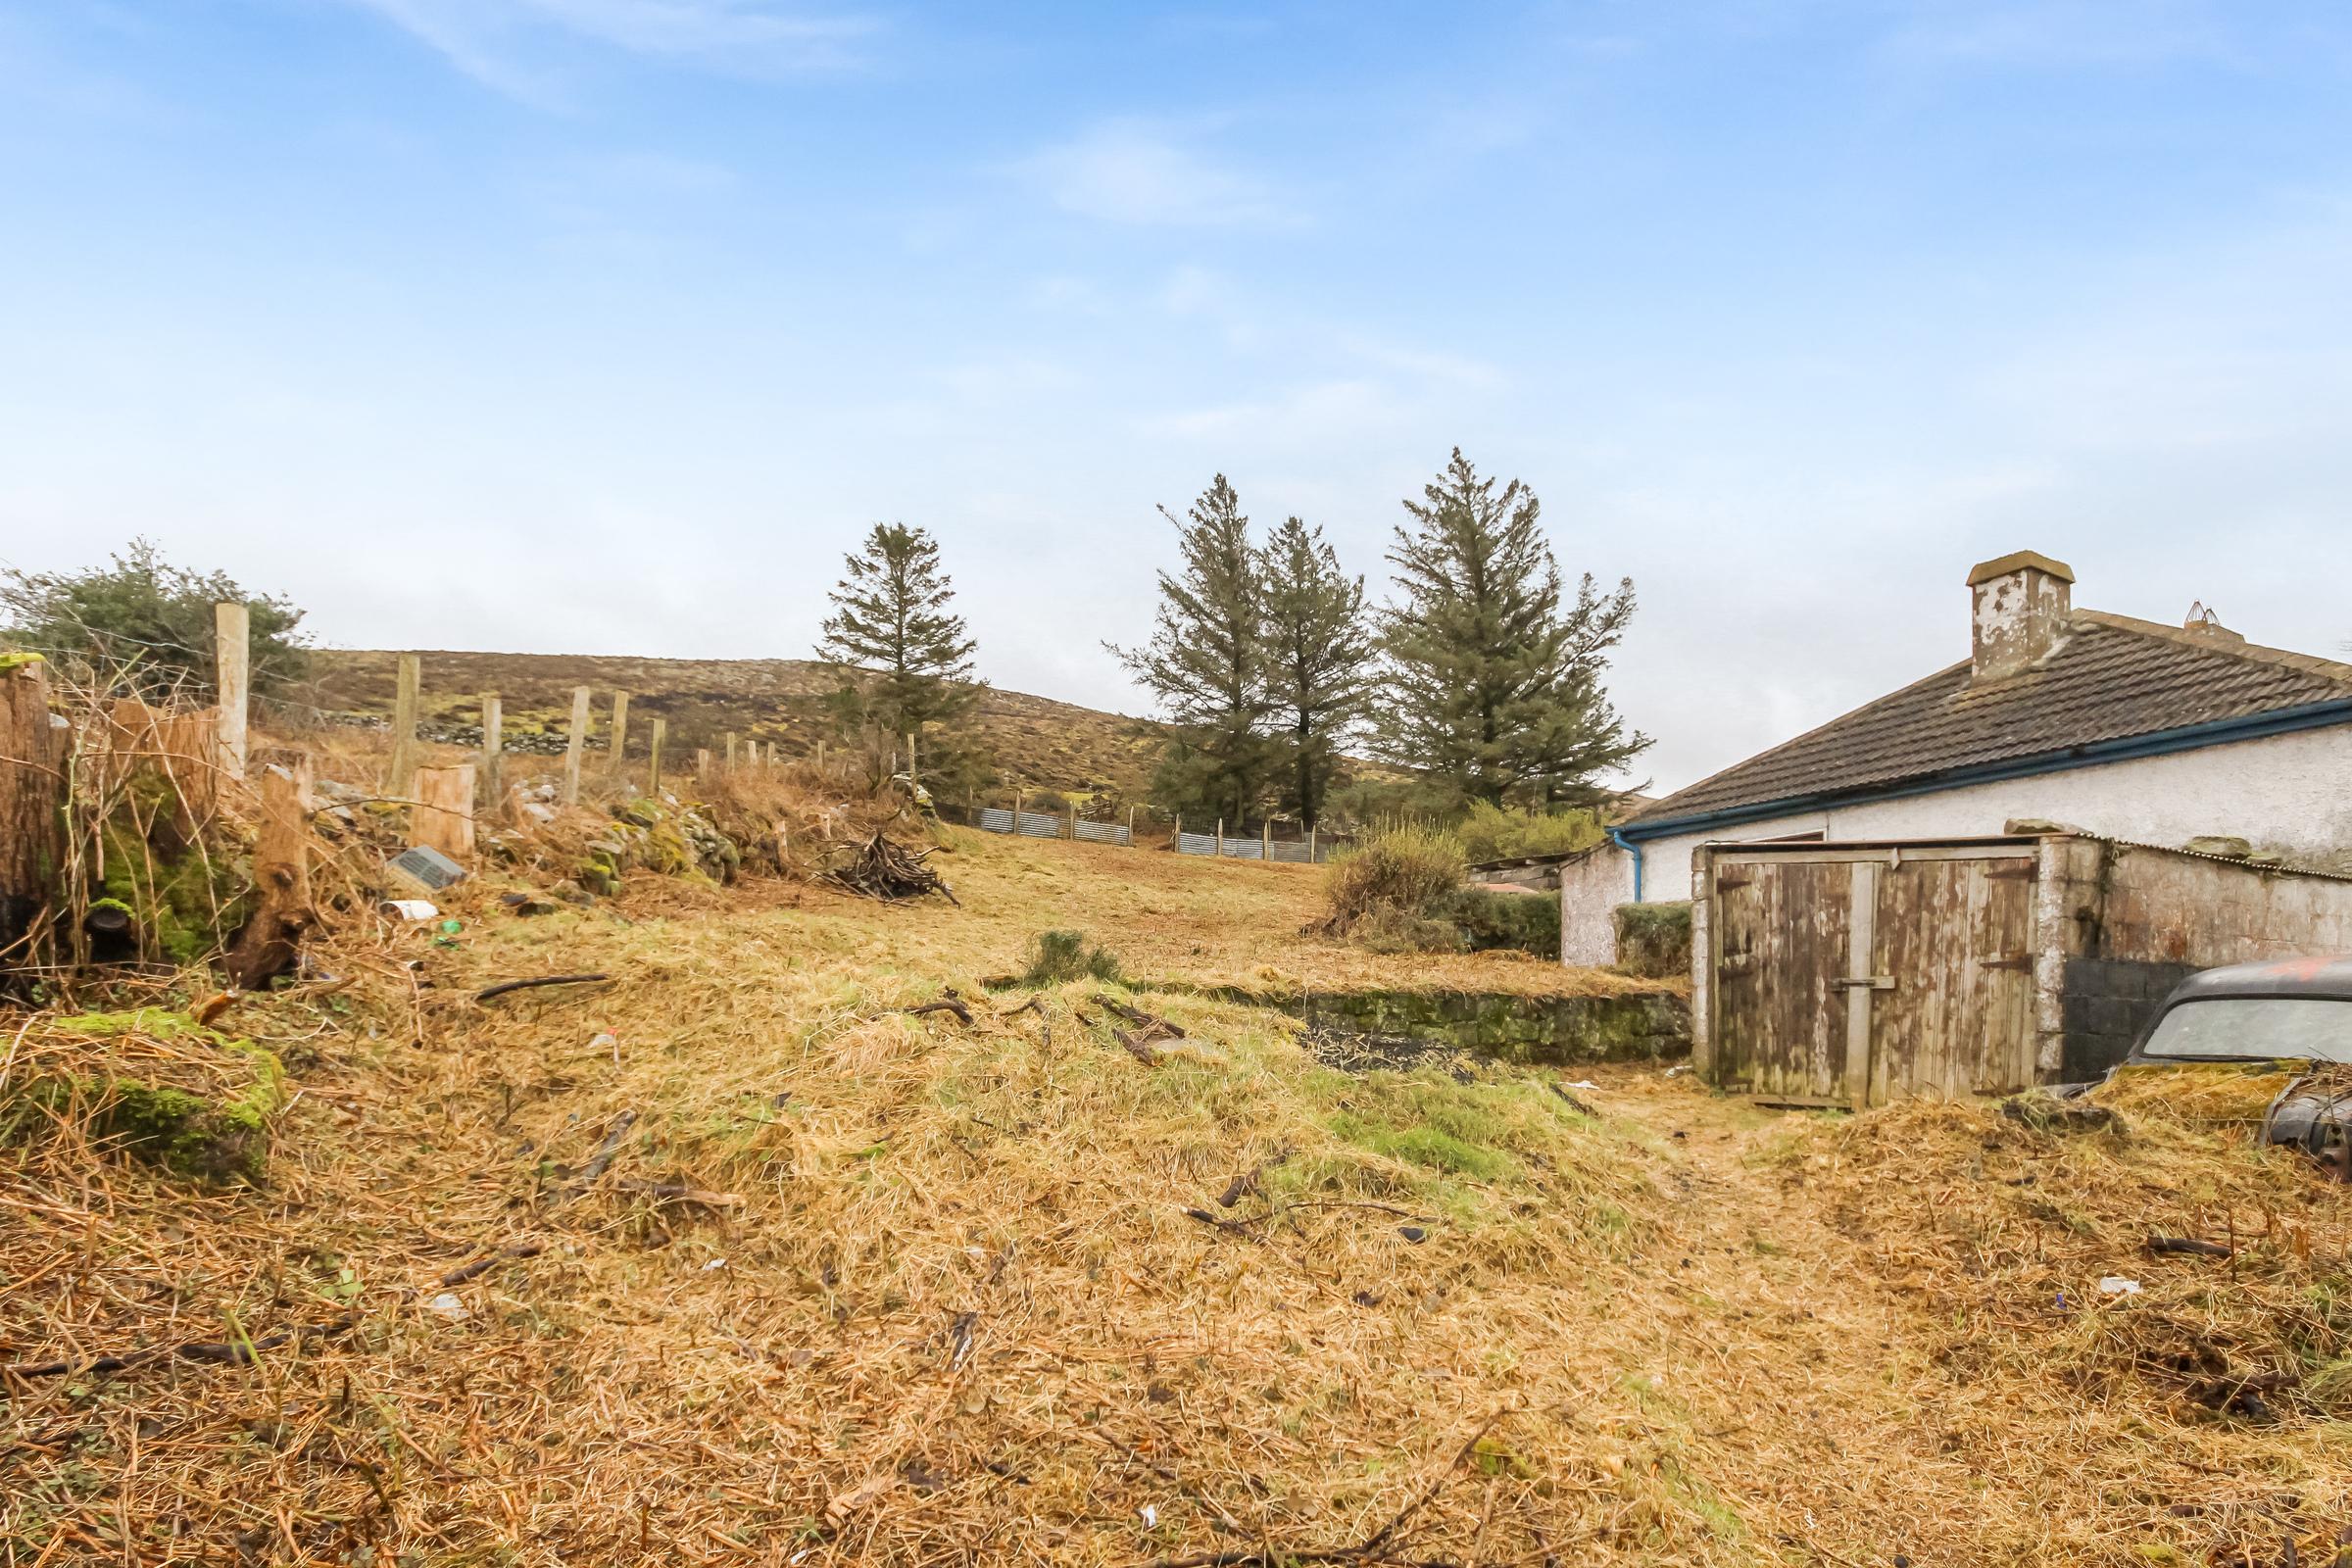 Ballynastockan, Valleymount, Lacken, Co. Wicklow